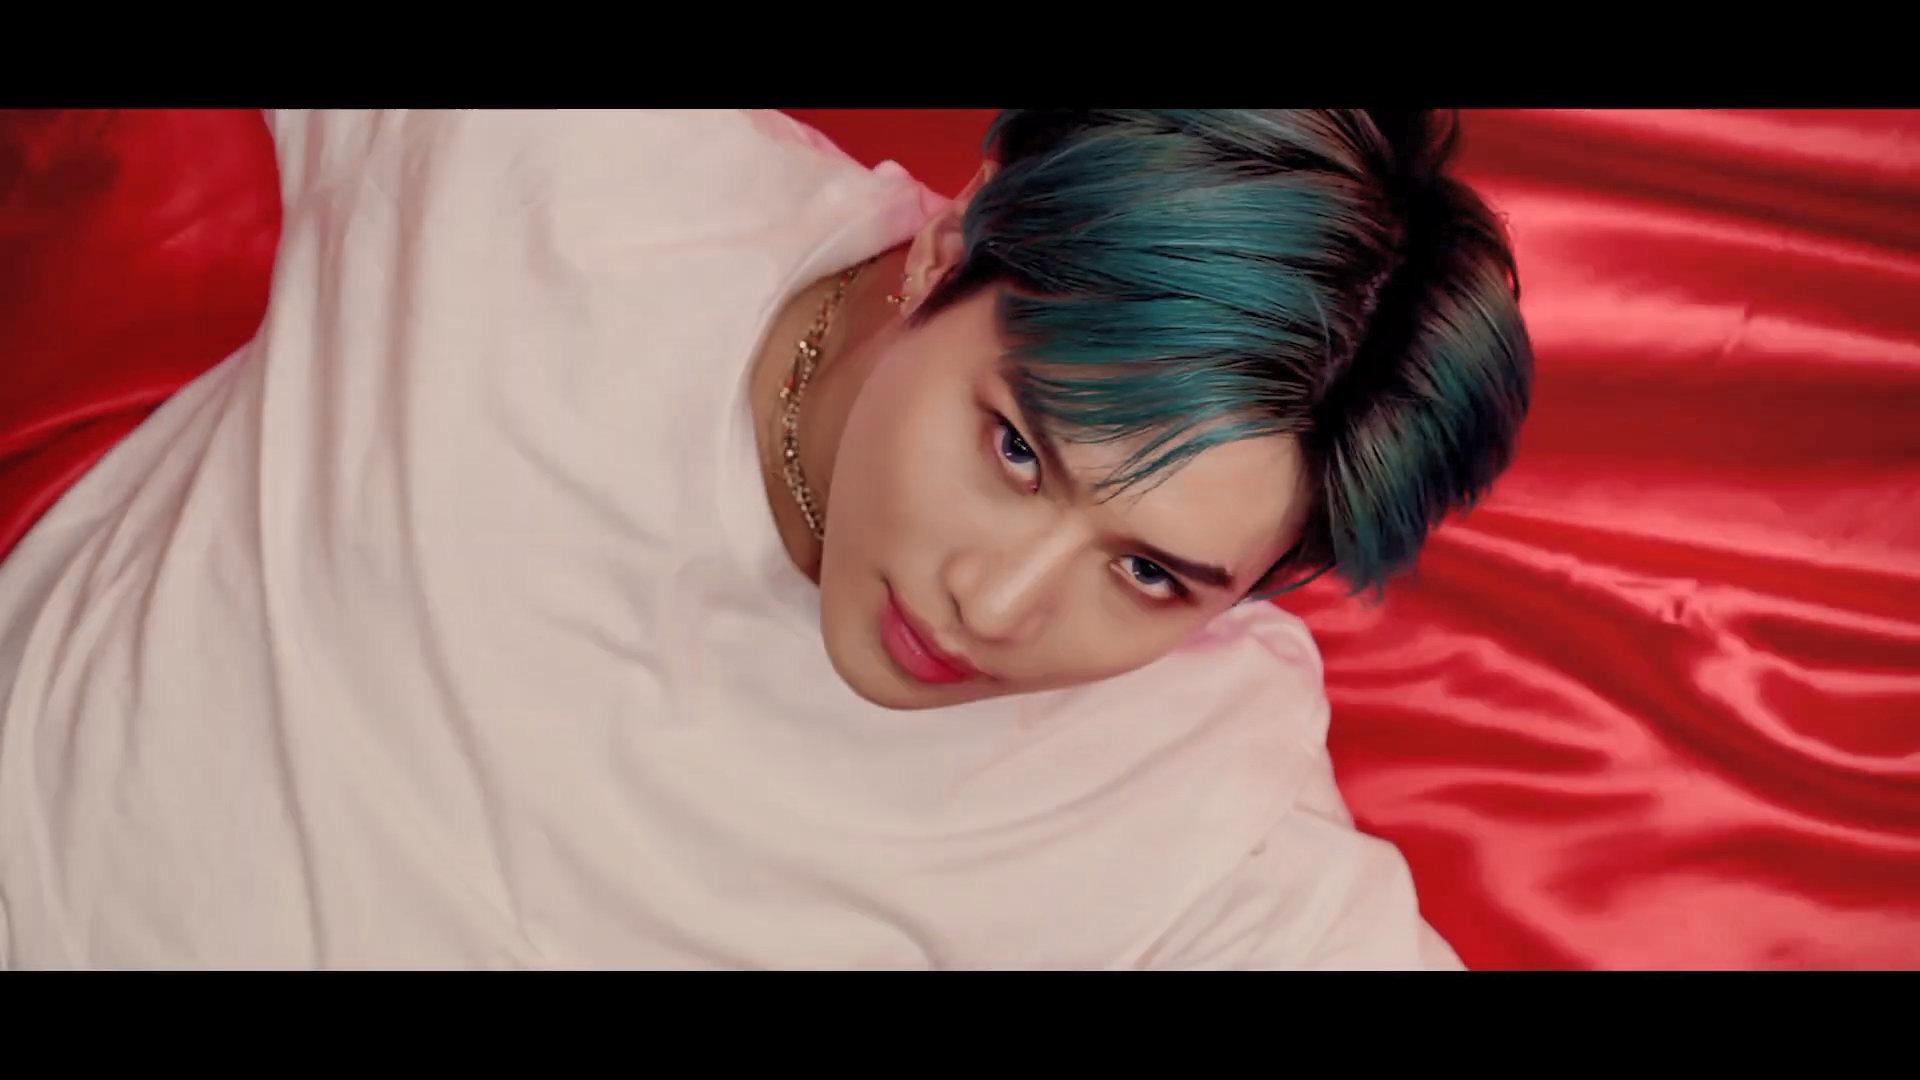 Shinee Dream Girl Wallpaper Taemin Famous Mv Screencaps K Pop Database Dbkpop Com